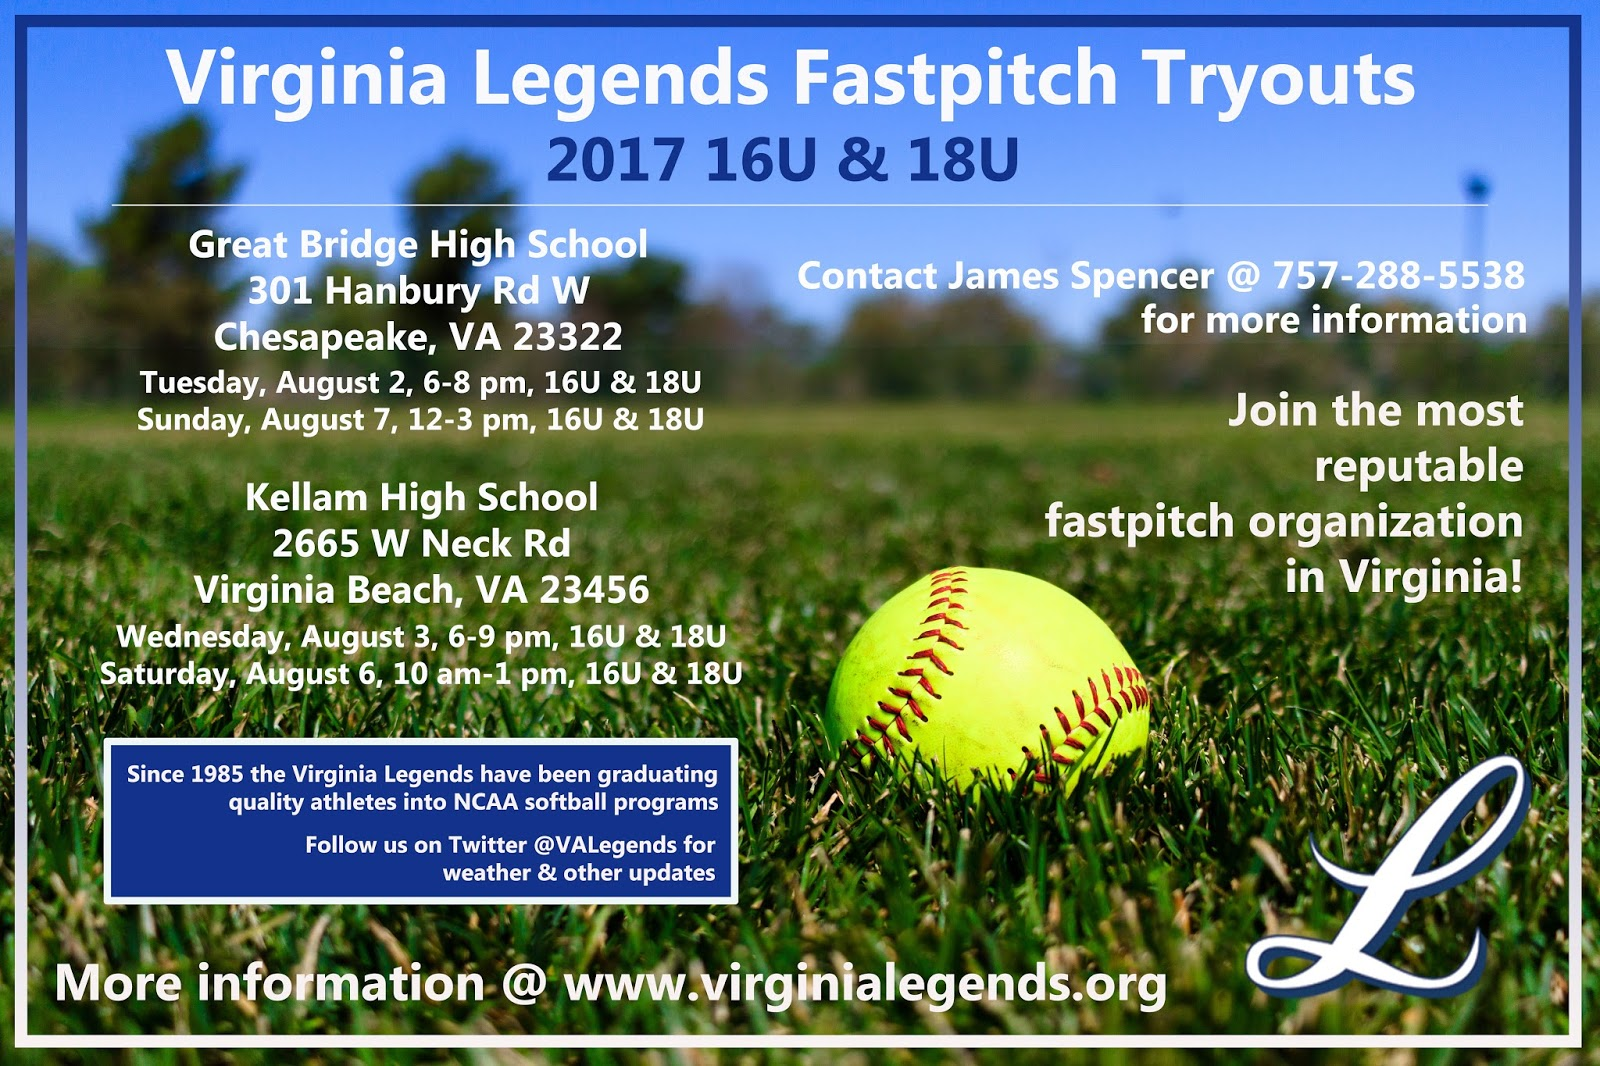 Virginia Legends Fastpitch News: July 2016